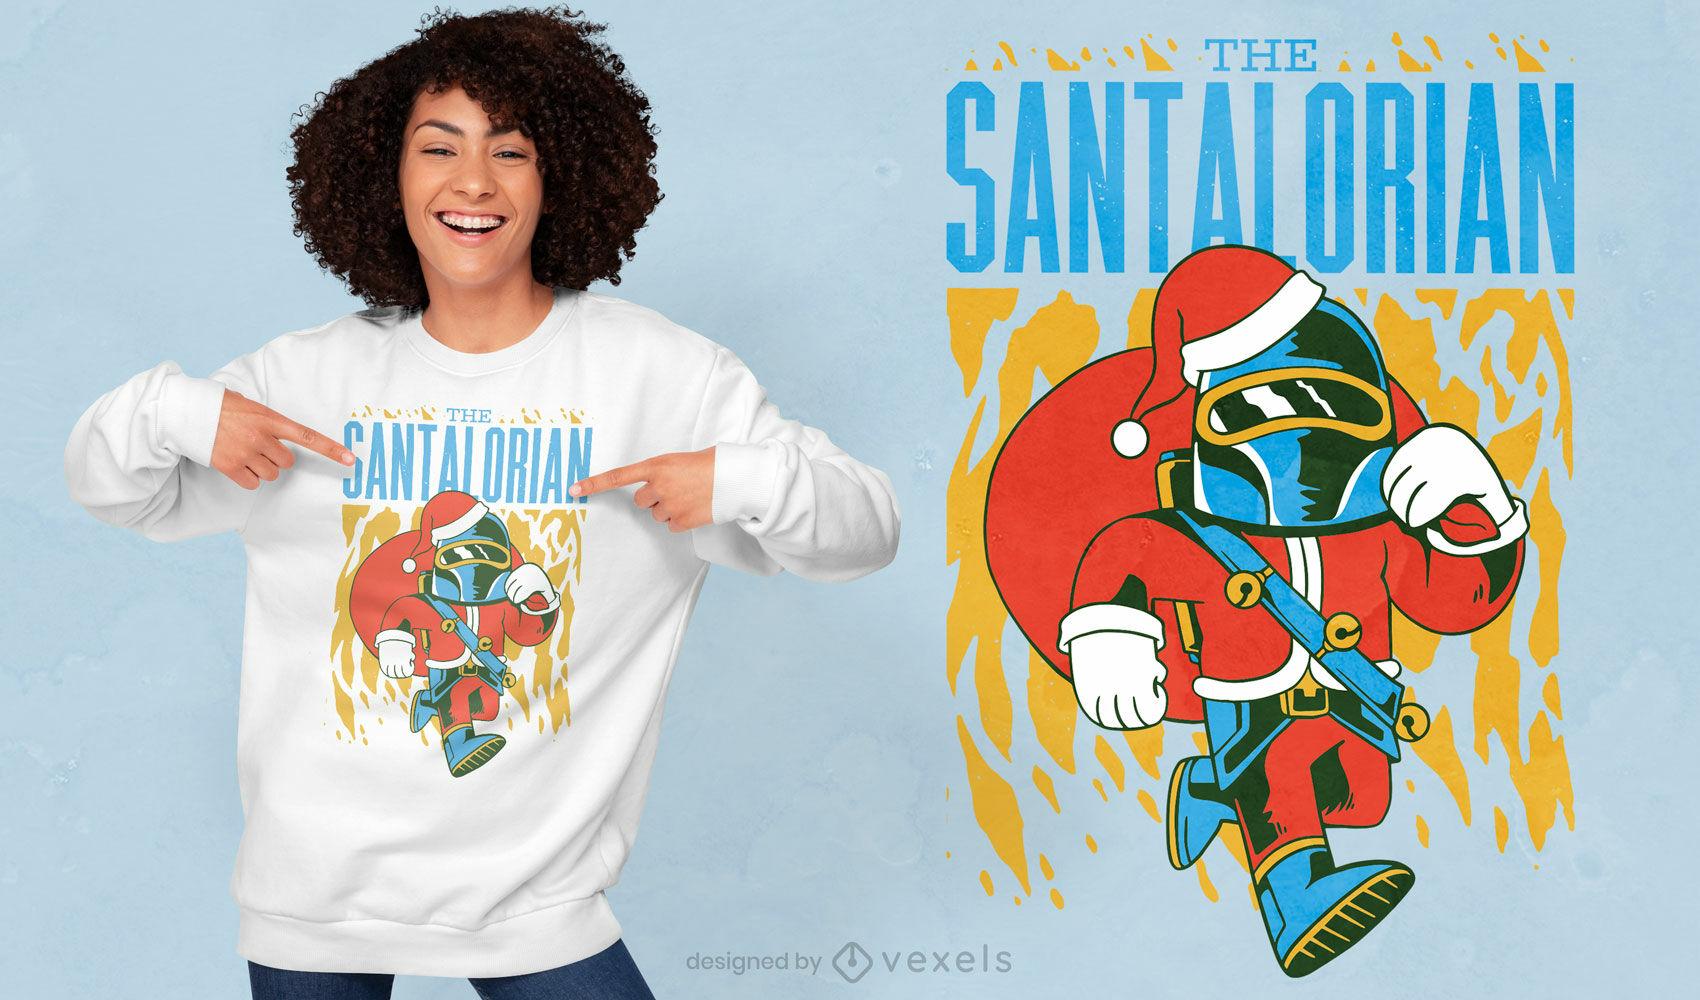 Santa claus mandalorian t-shirt design